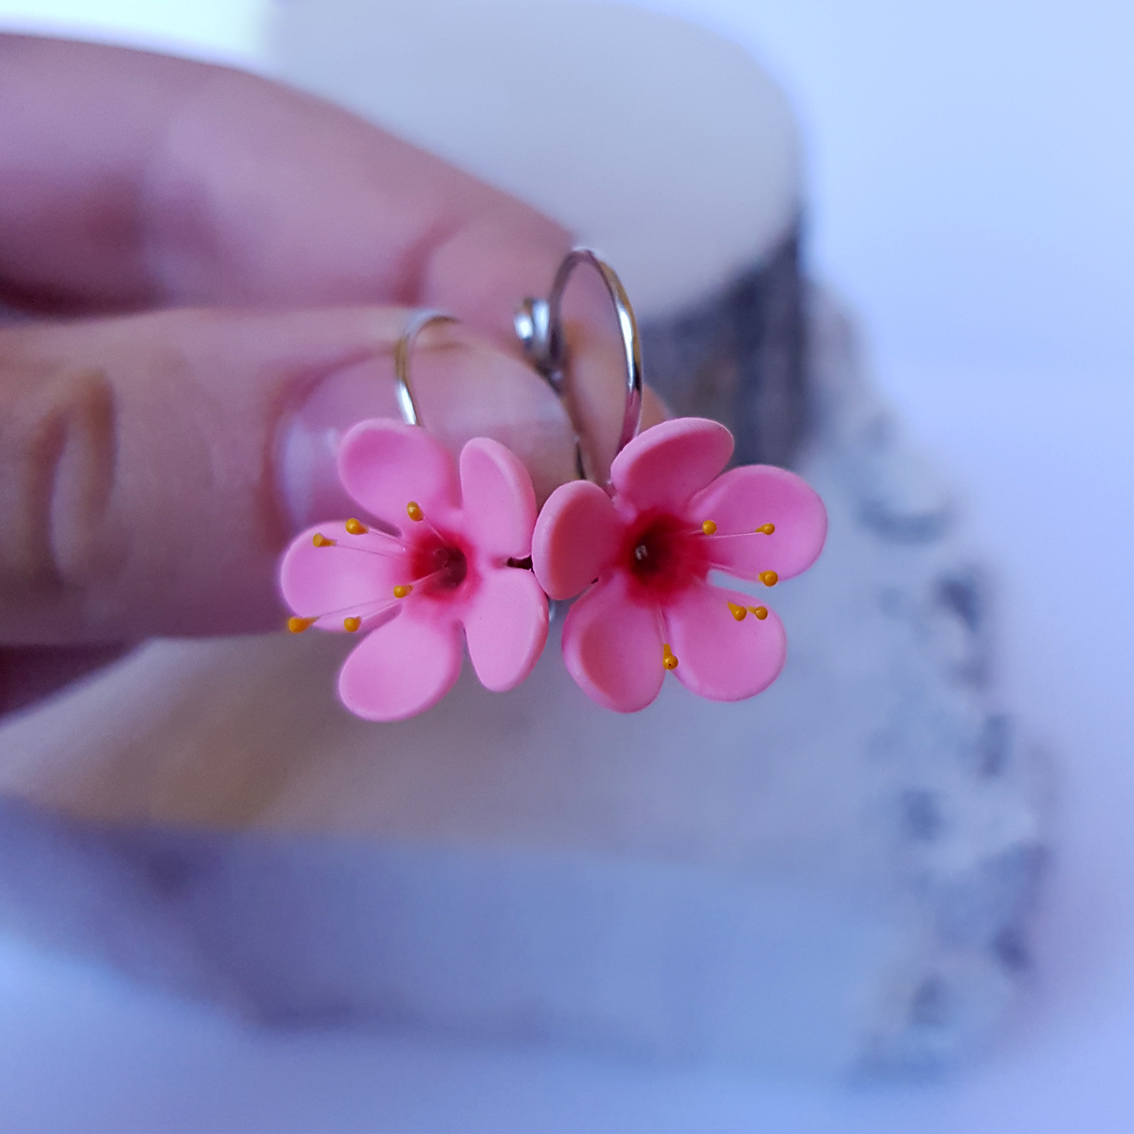 cires roz